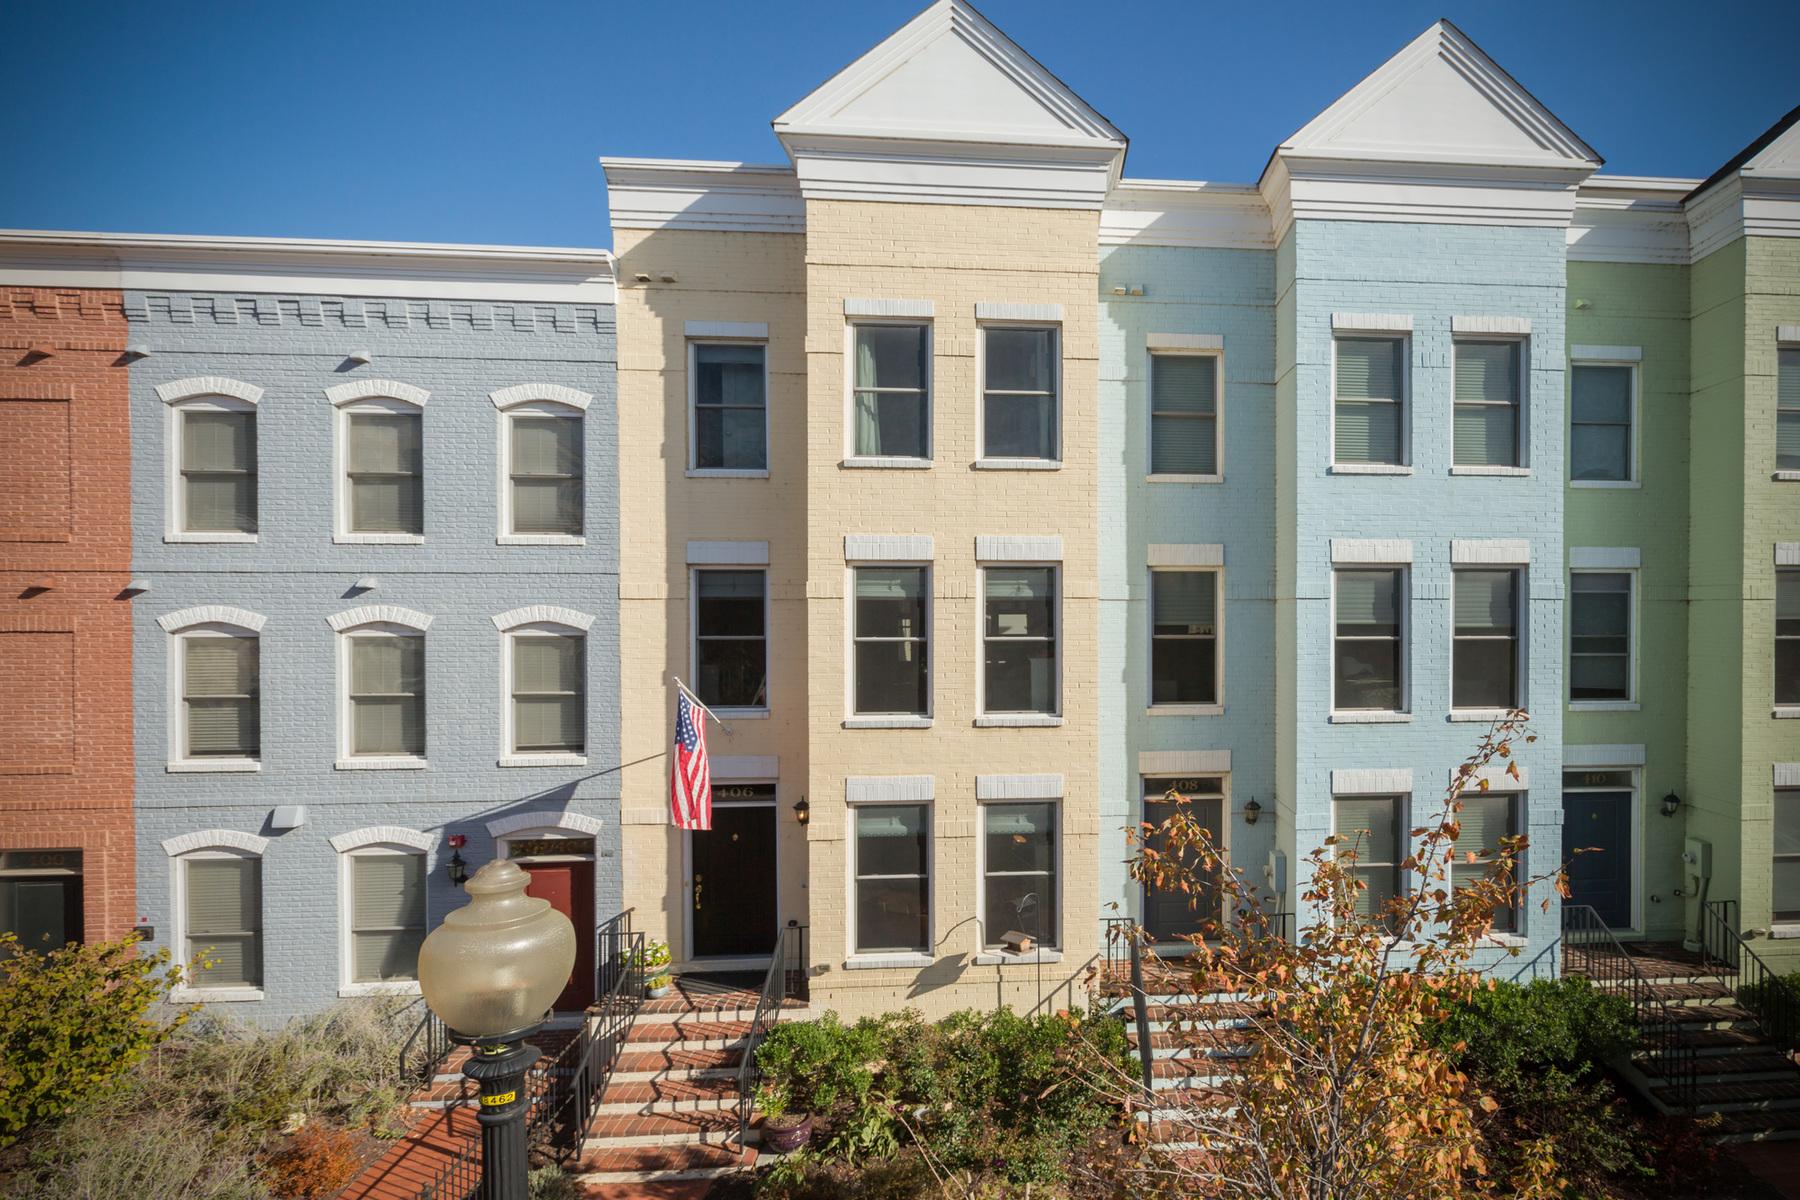 Property For Sale at 406 L Street Se, Washington